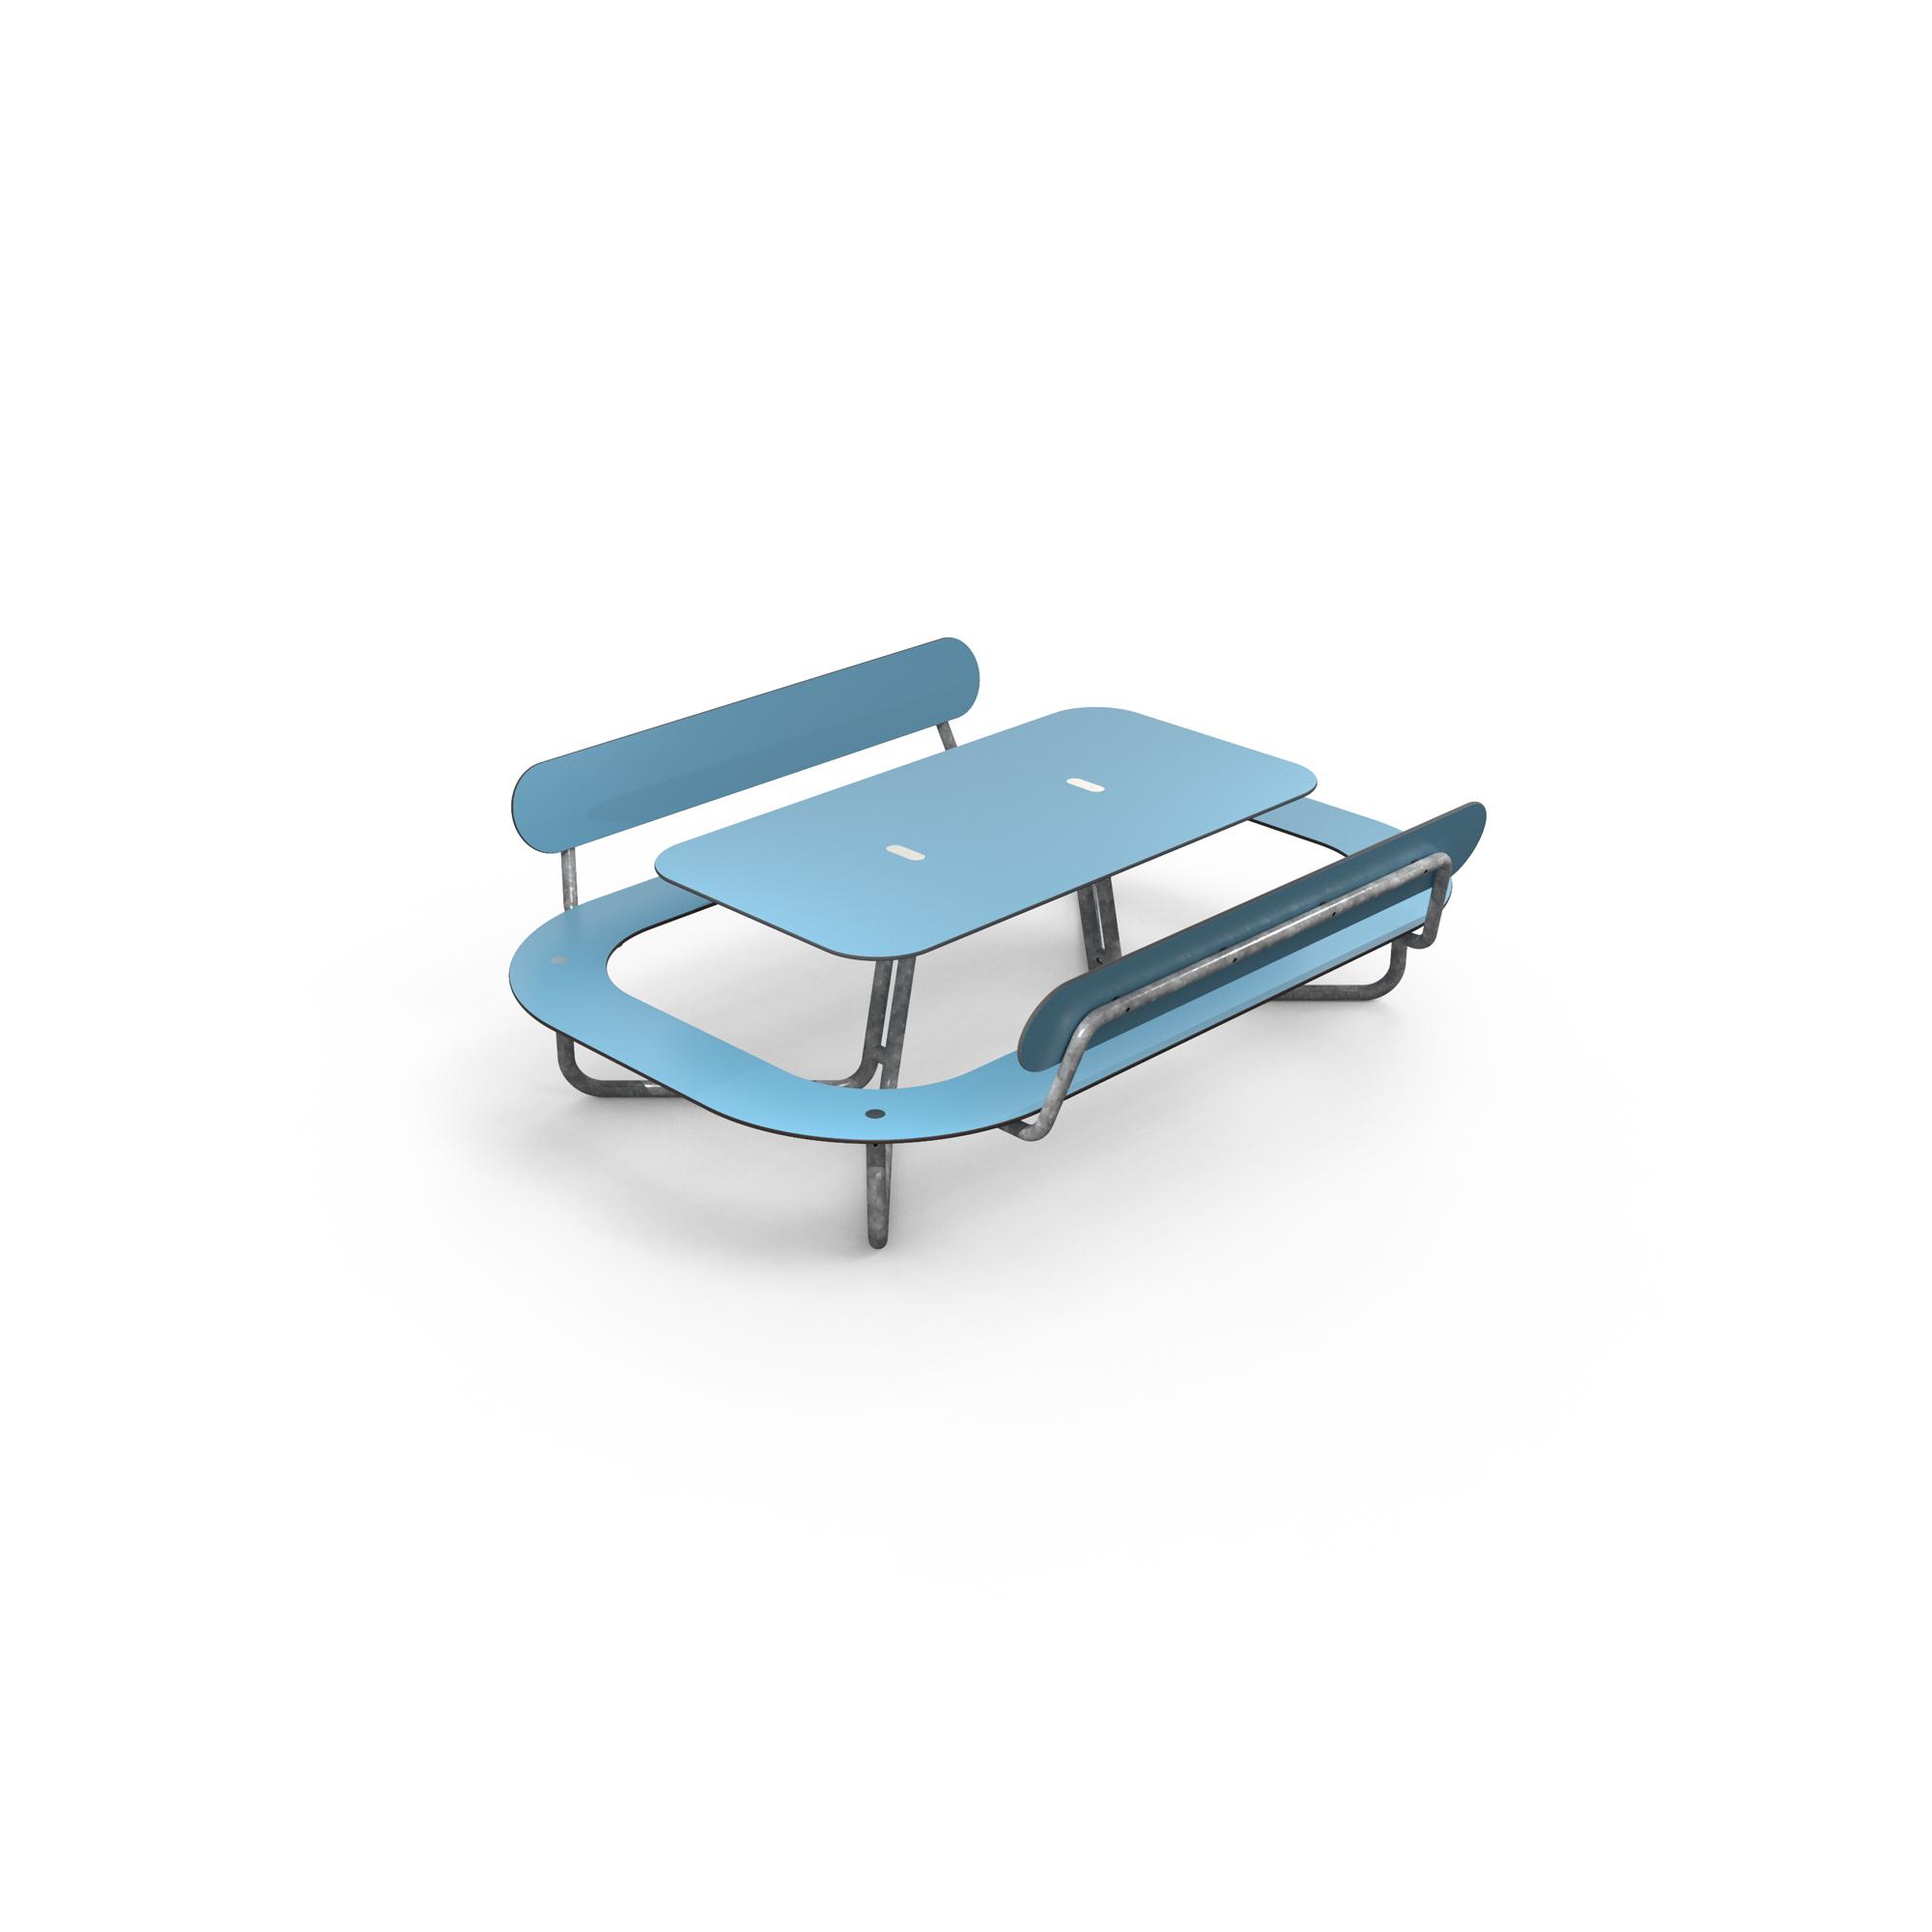 Plateau-O picknicktafel met rugleuning blauw